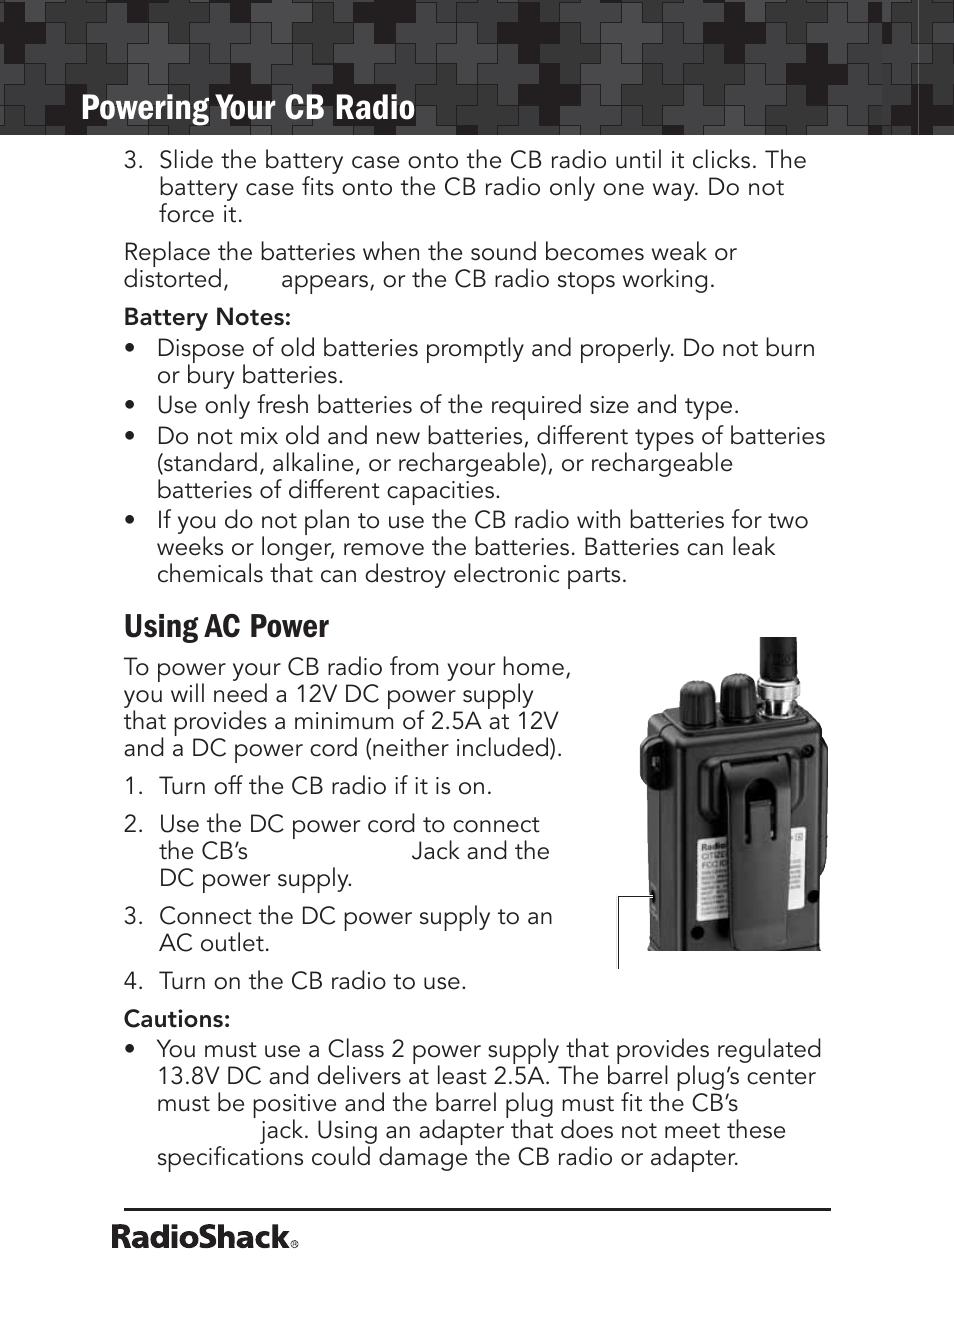 powering your cb radio using ac power radio shack 21 1679 user rh manualsdir com Radio Shack Products Radio Shack Stores